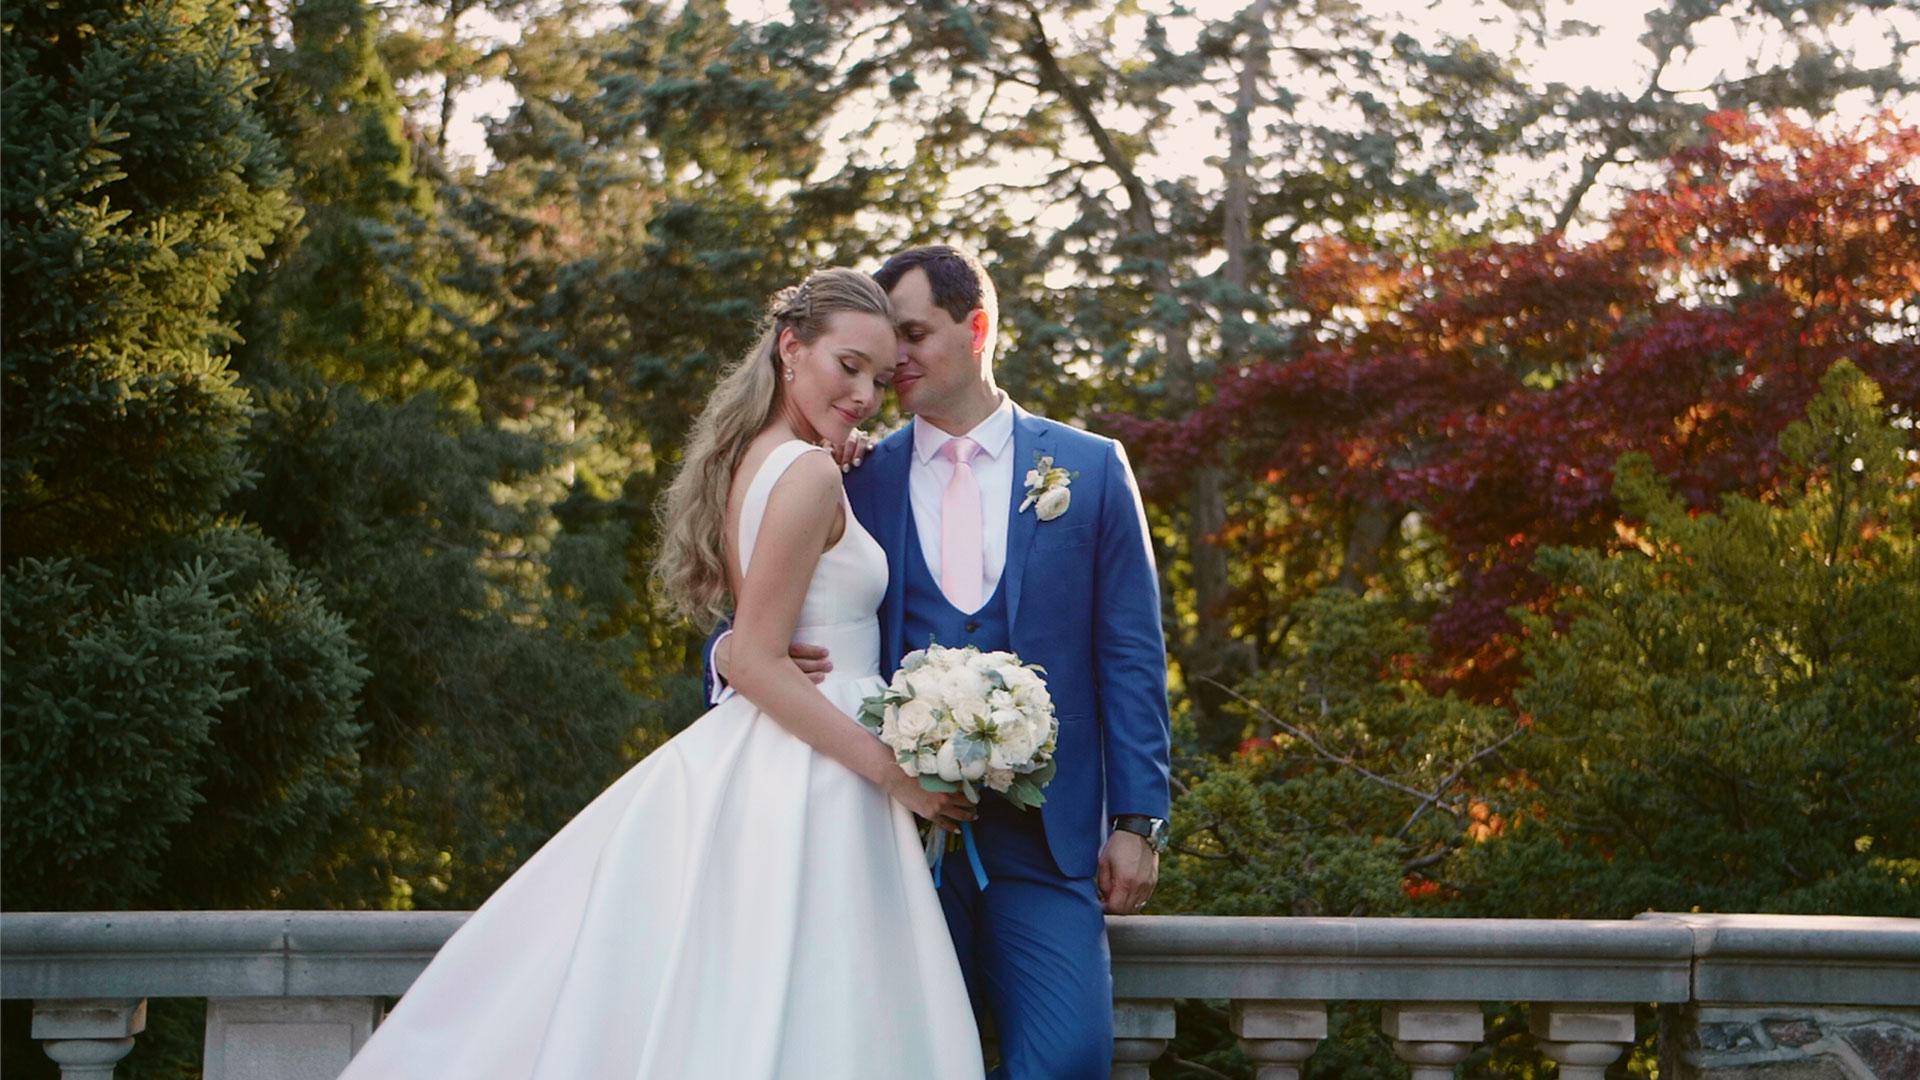 bride and group at their Graydon hall manor wedding by Toronto wedding videographer kismet creative